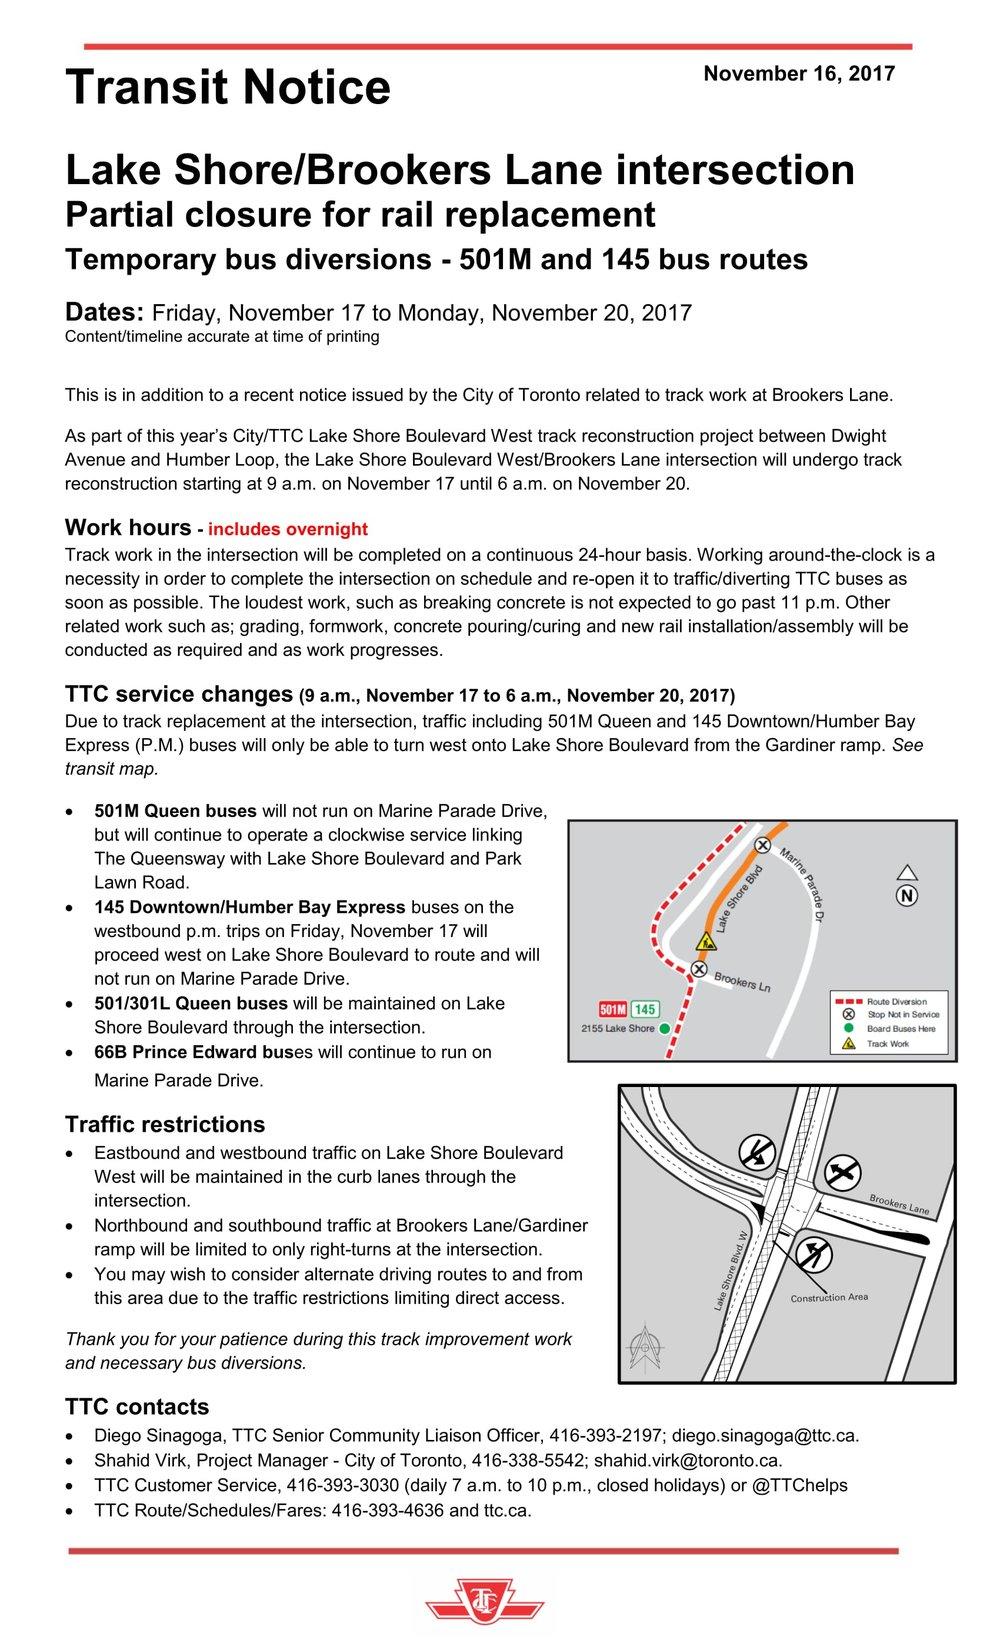 Transit notice - Lake Shore - Brookers intersection - Nov 2017-1.jpg